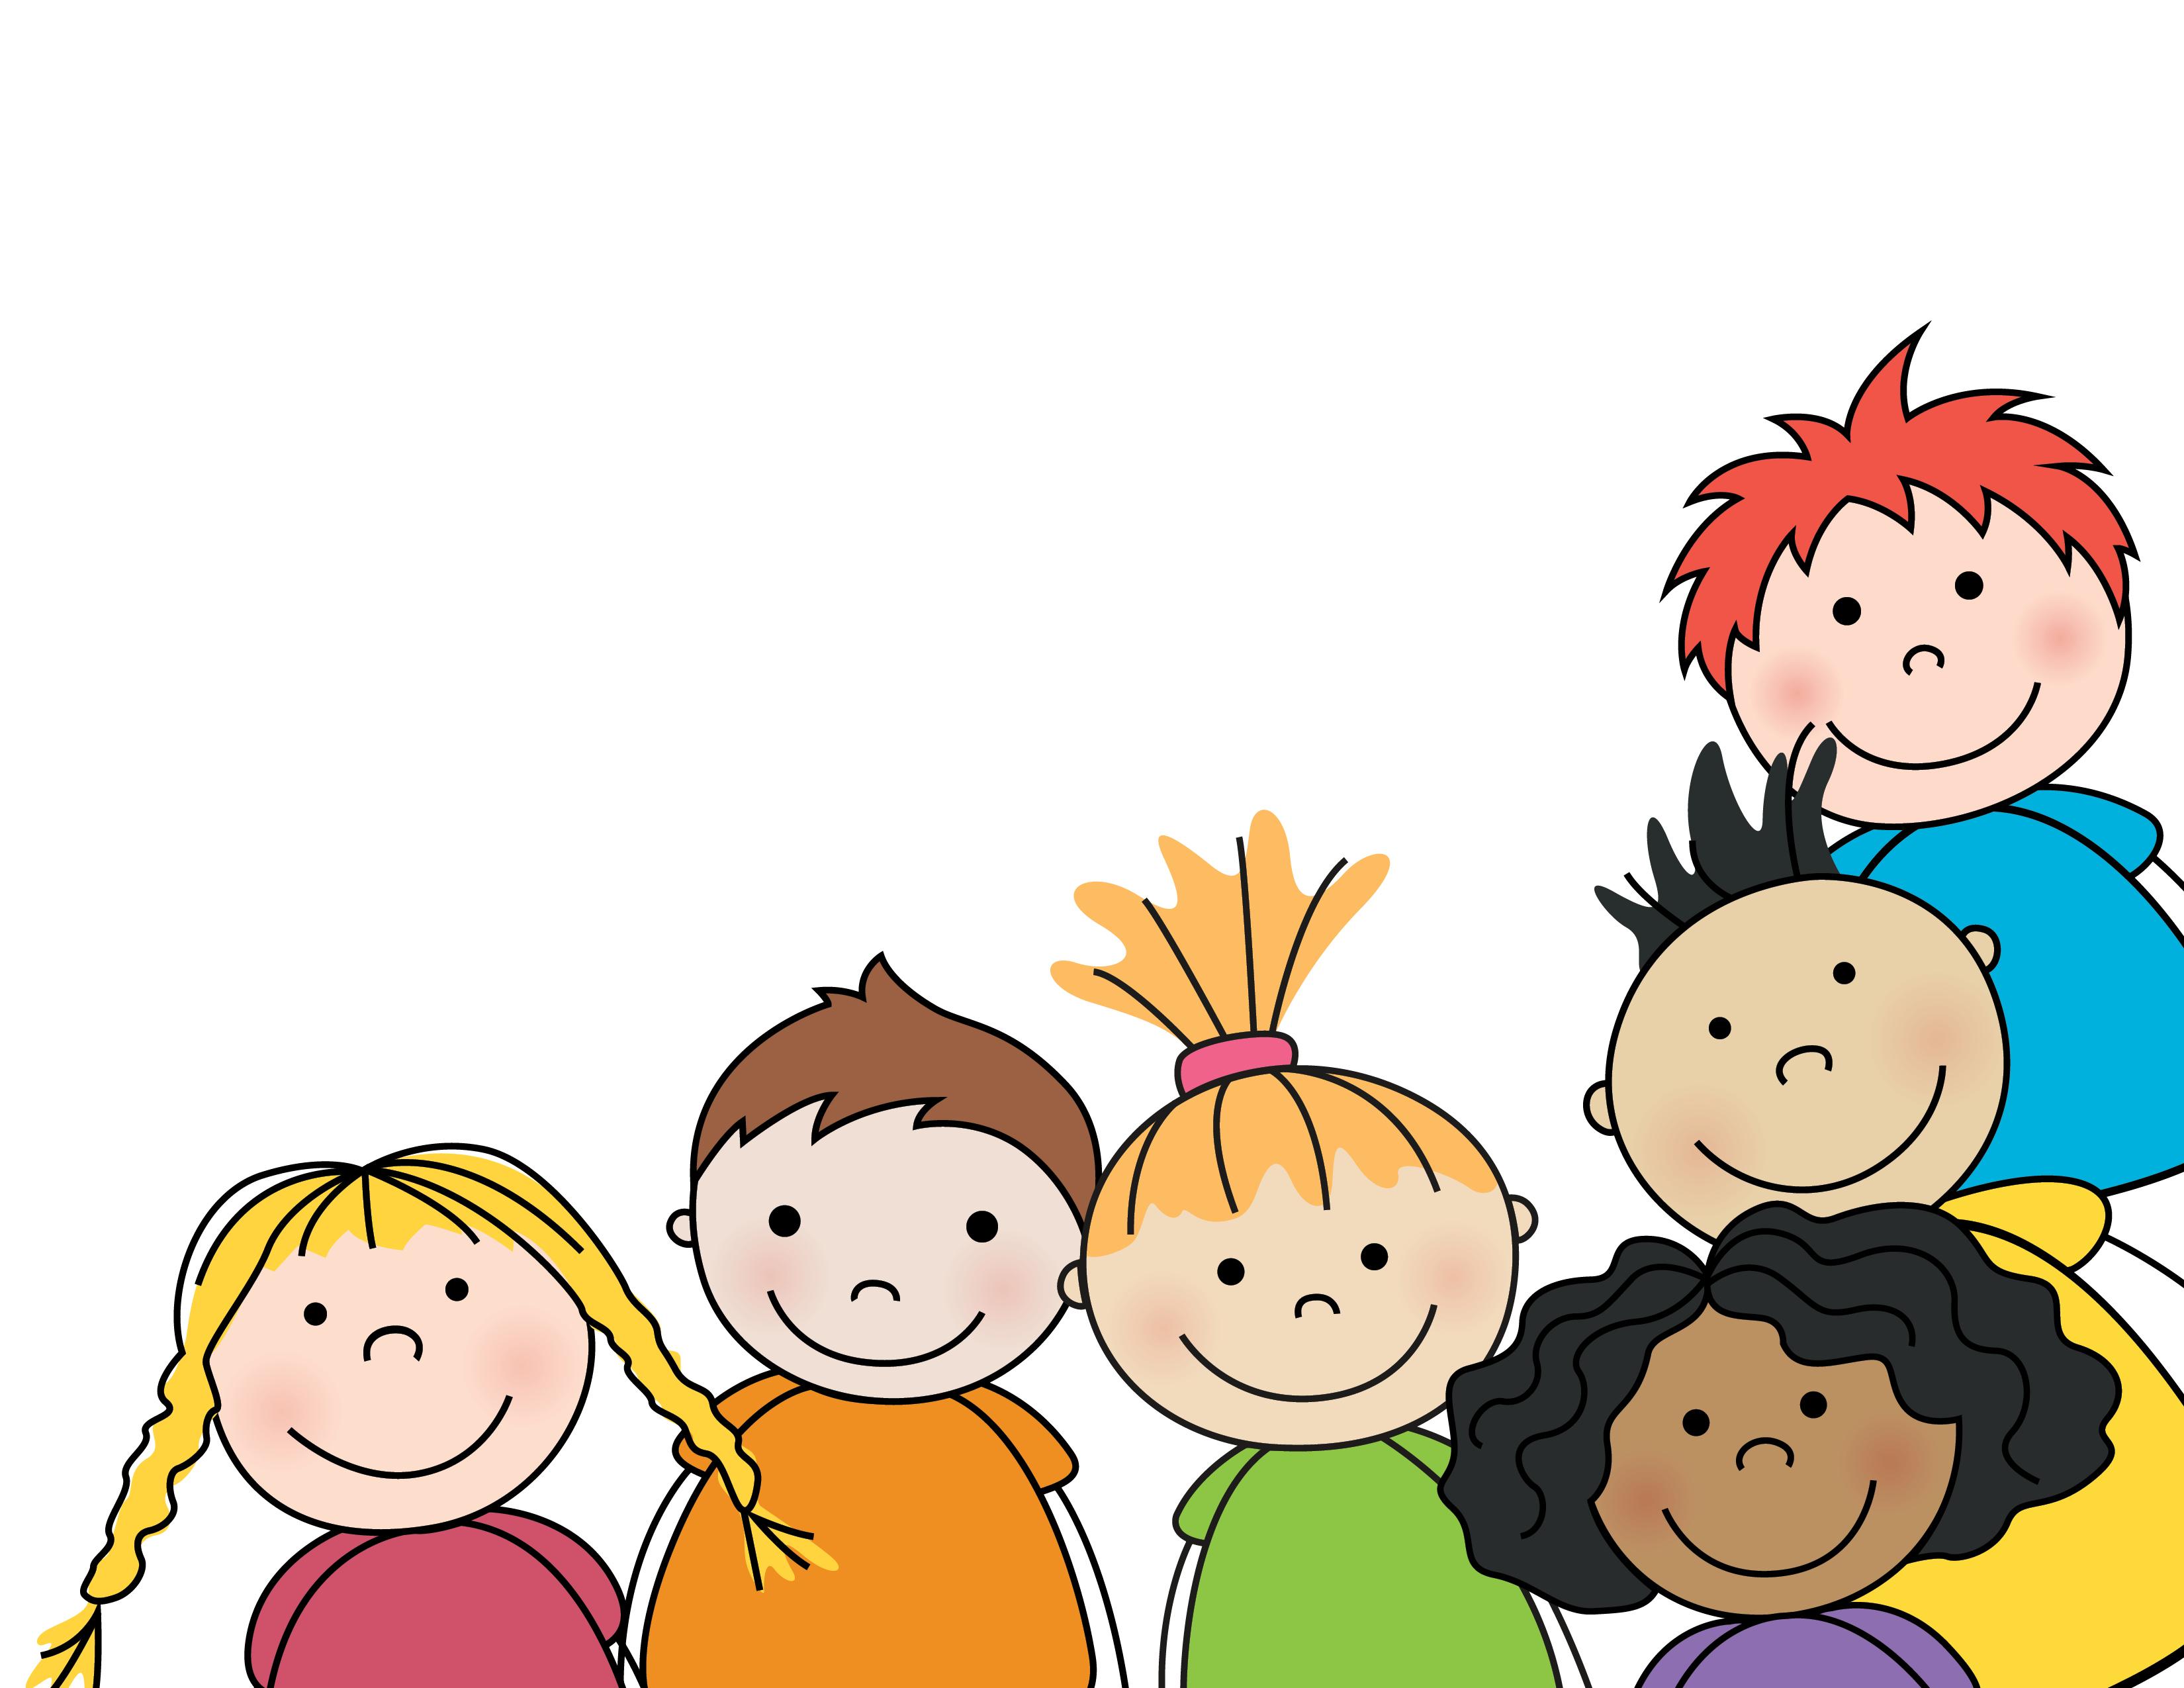 Kindergarten kids clipart clip art free stock Kindergarten kids clipart - ClipartFest clip art free stock